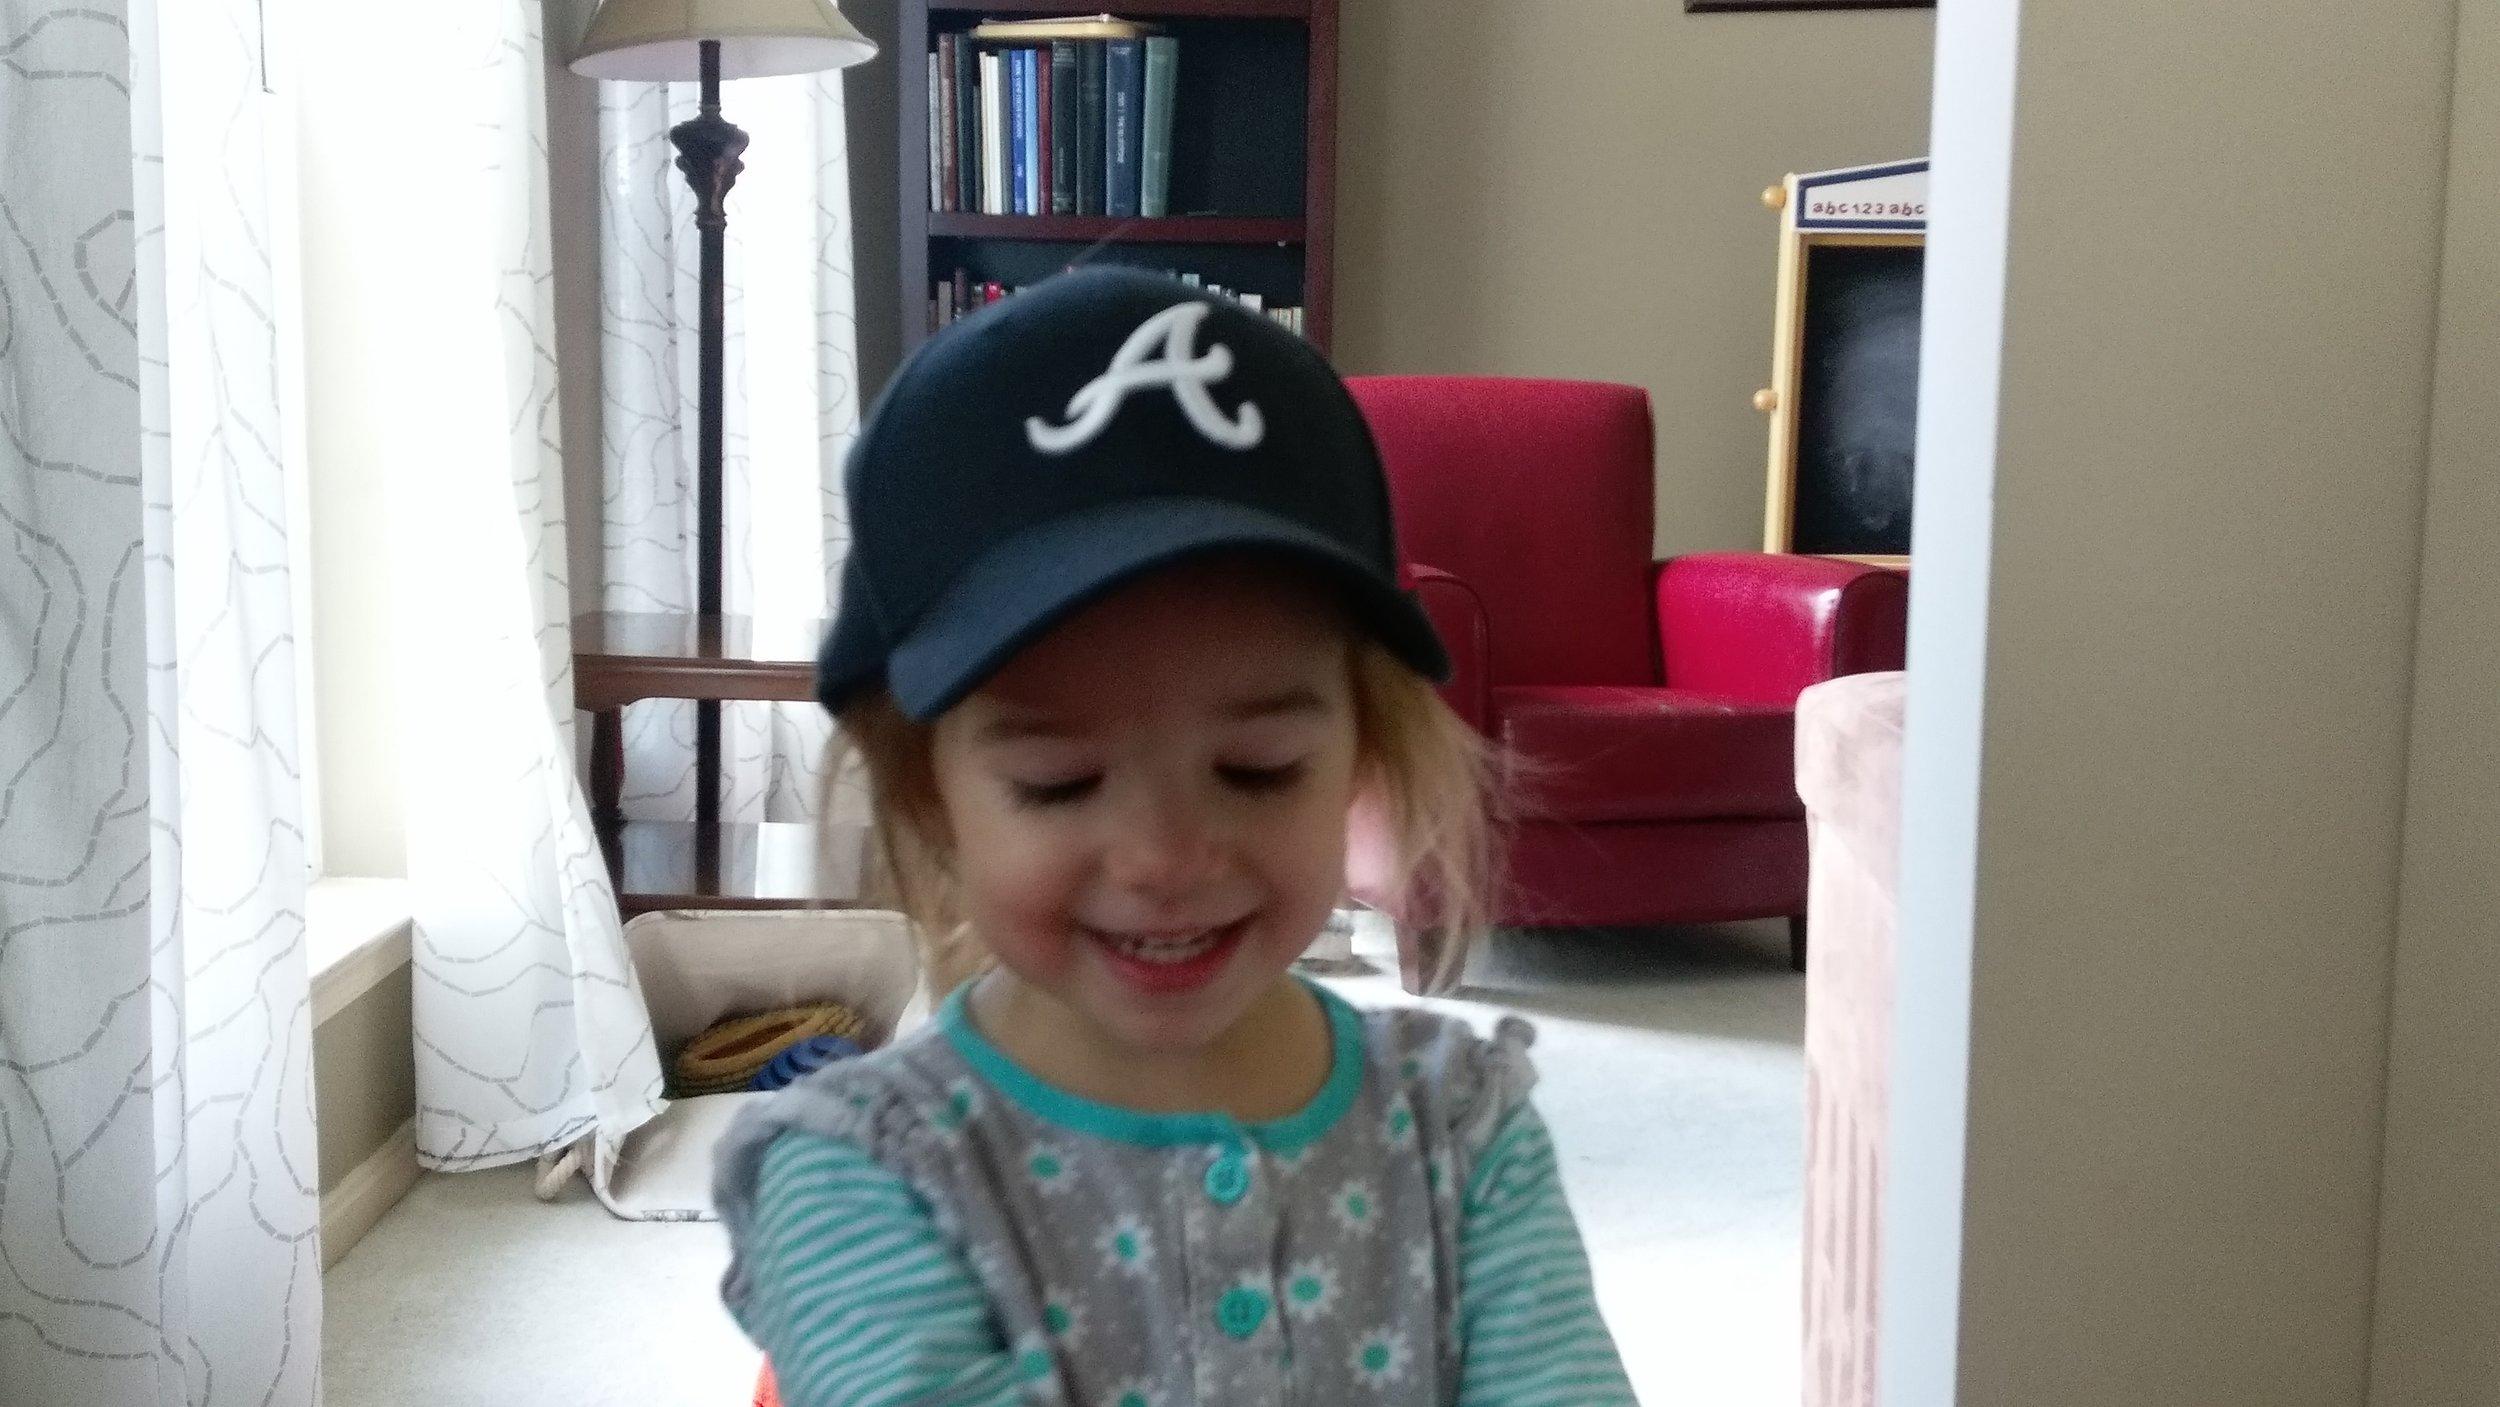 Finally grew into her best hat.